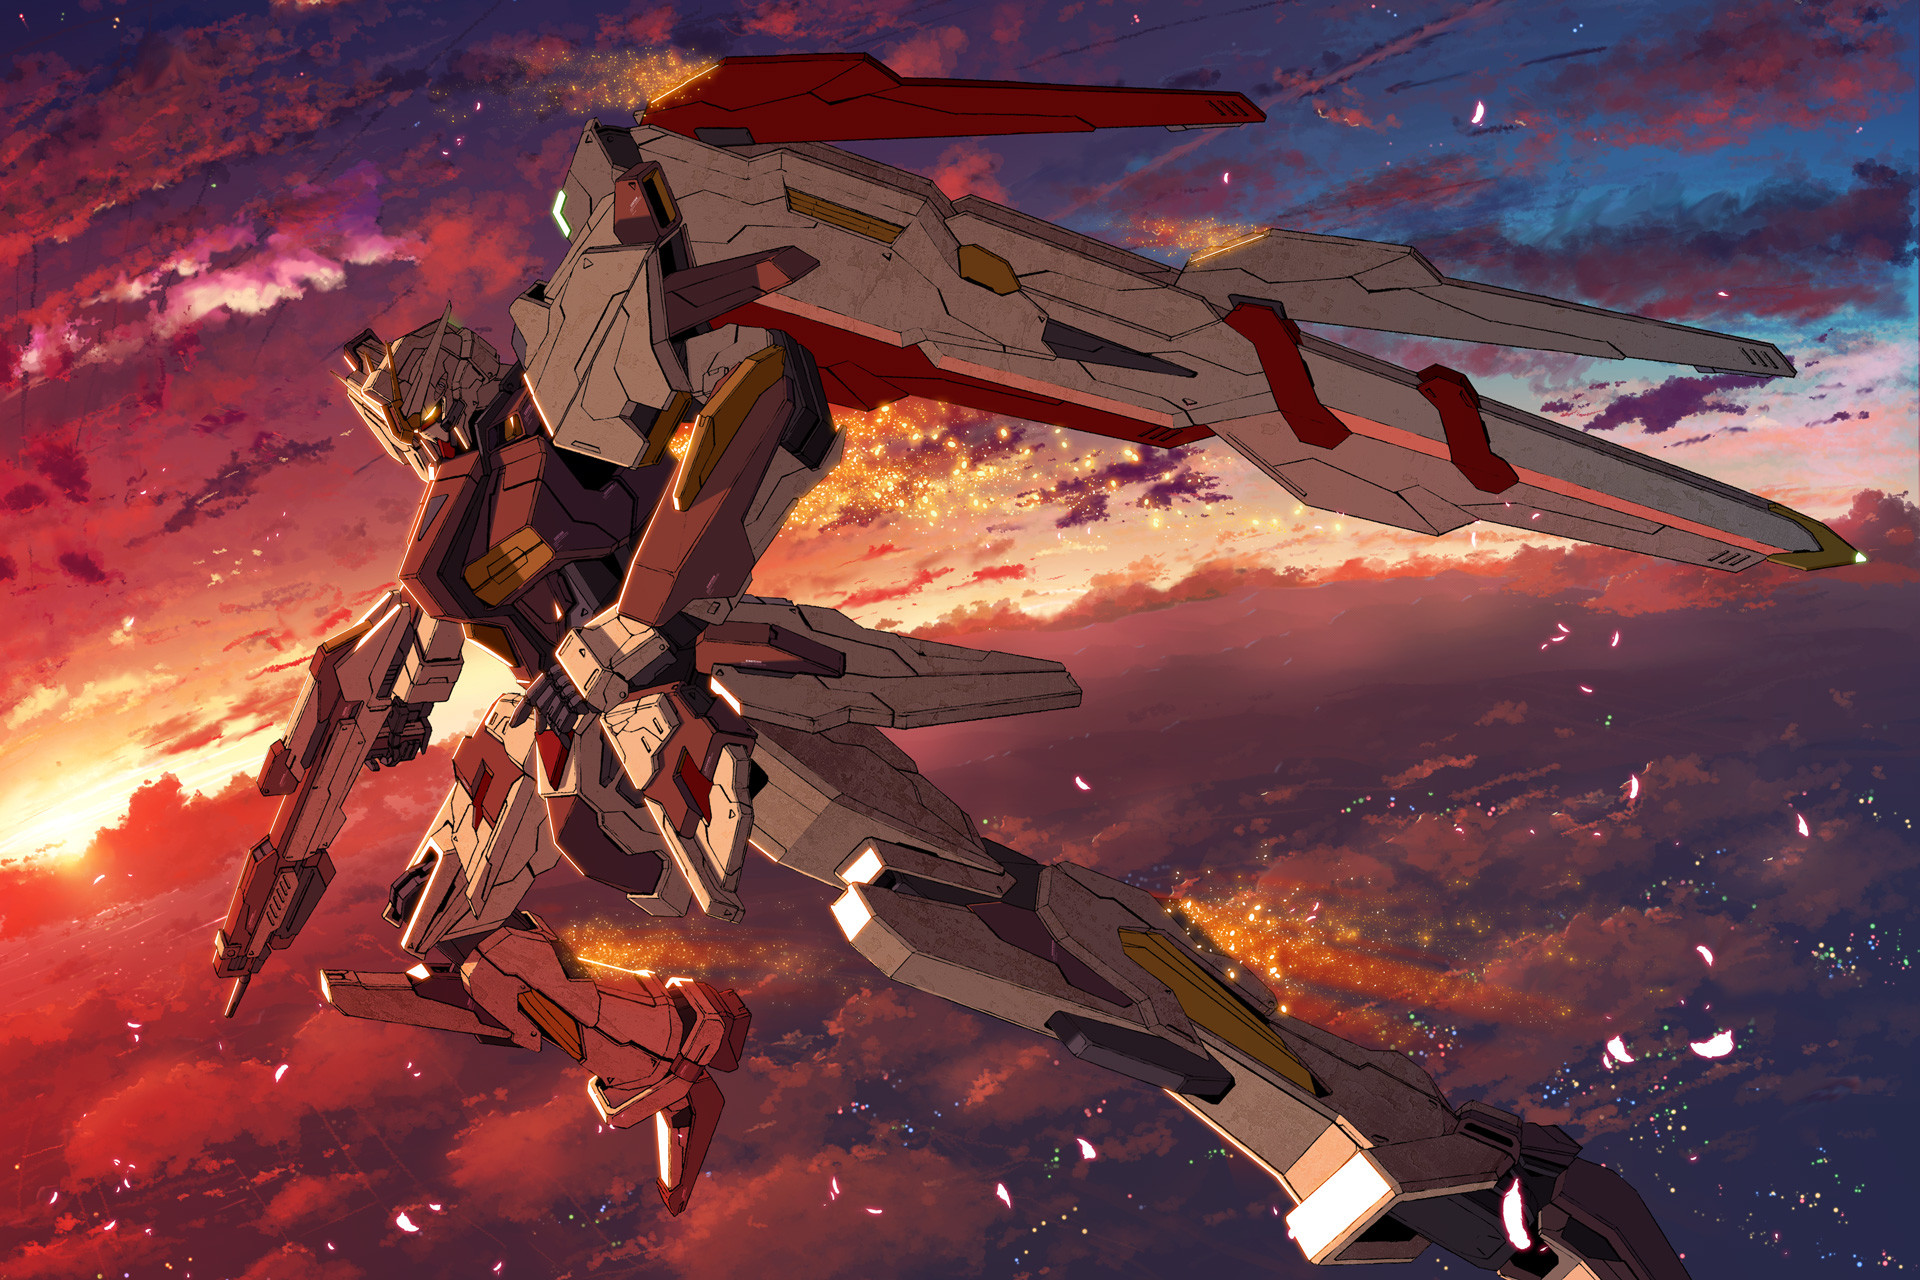 Gundam Unicorn Wallpapers Images As Wallpaper HD